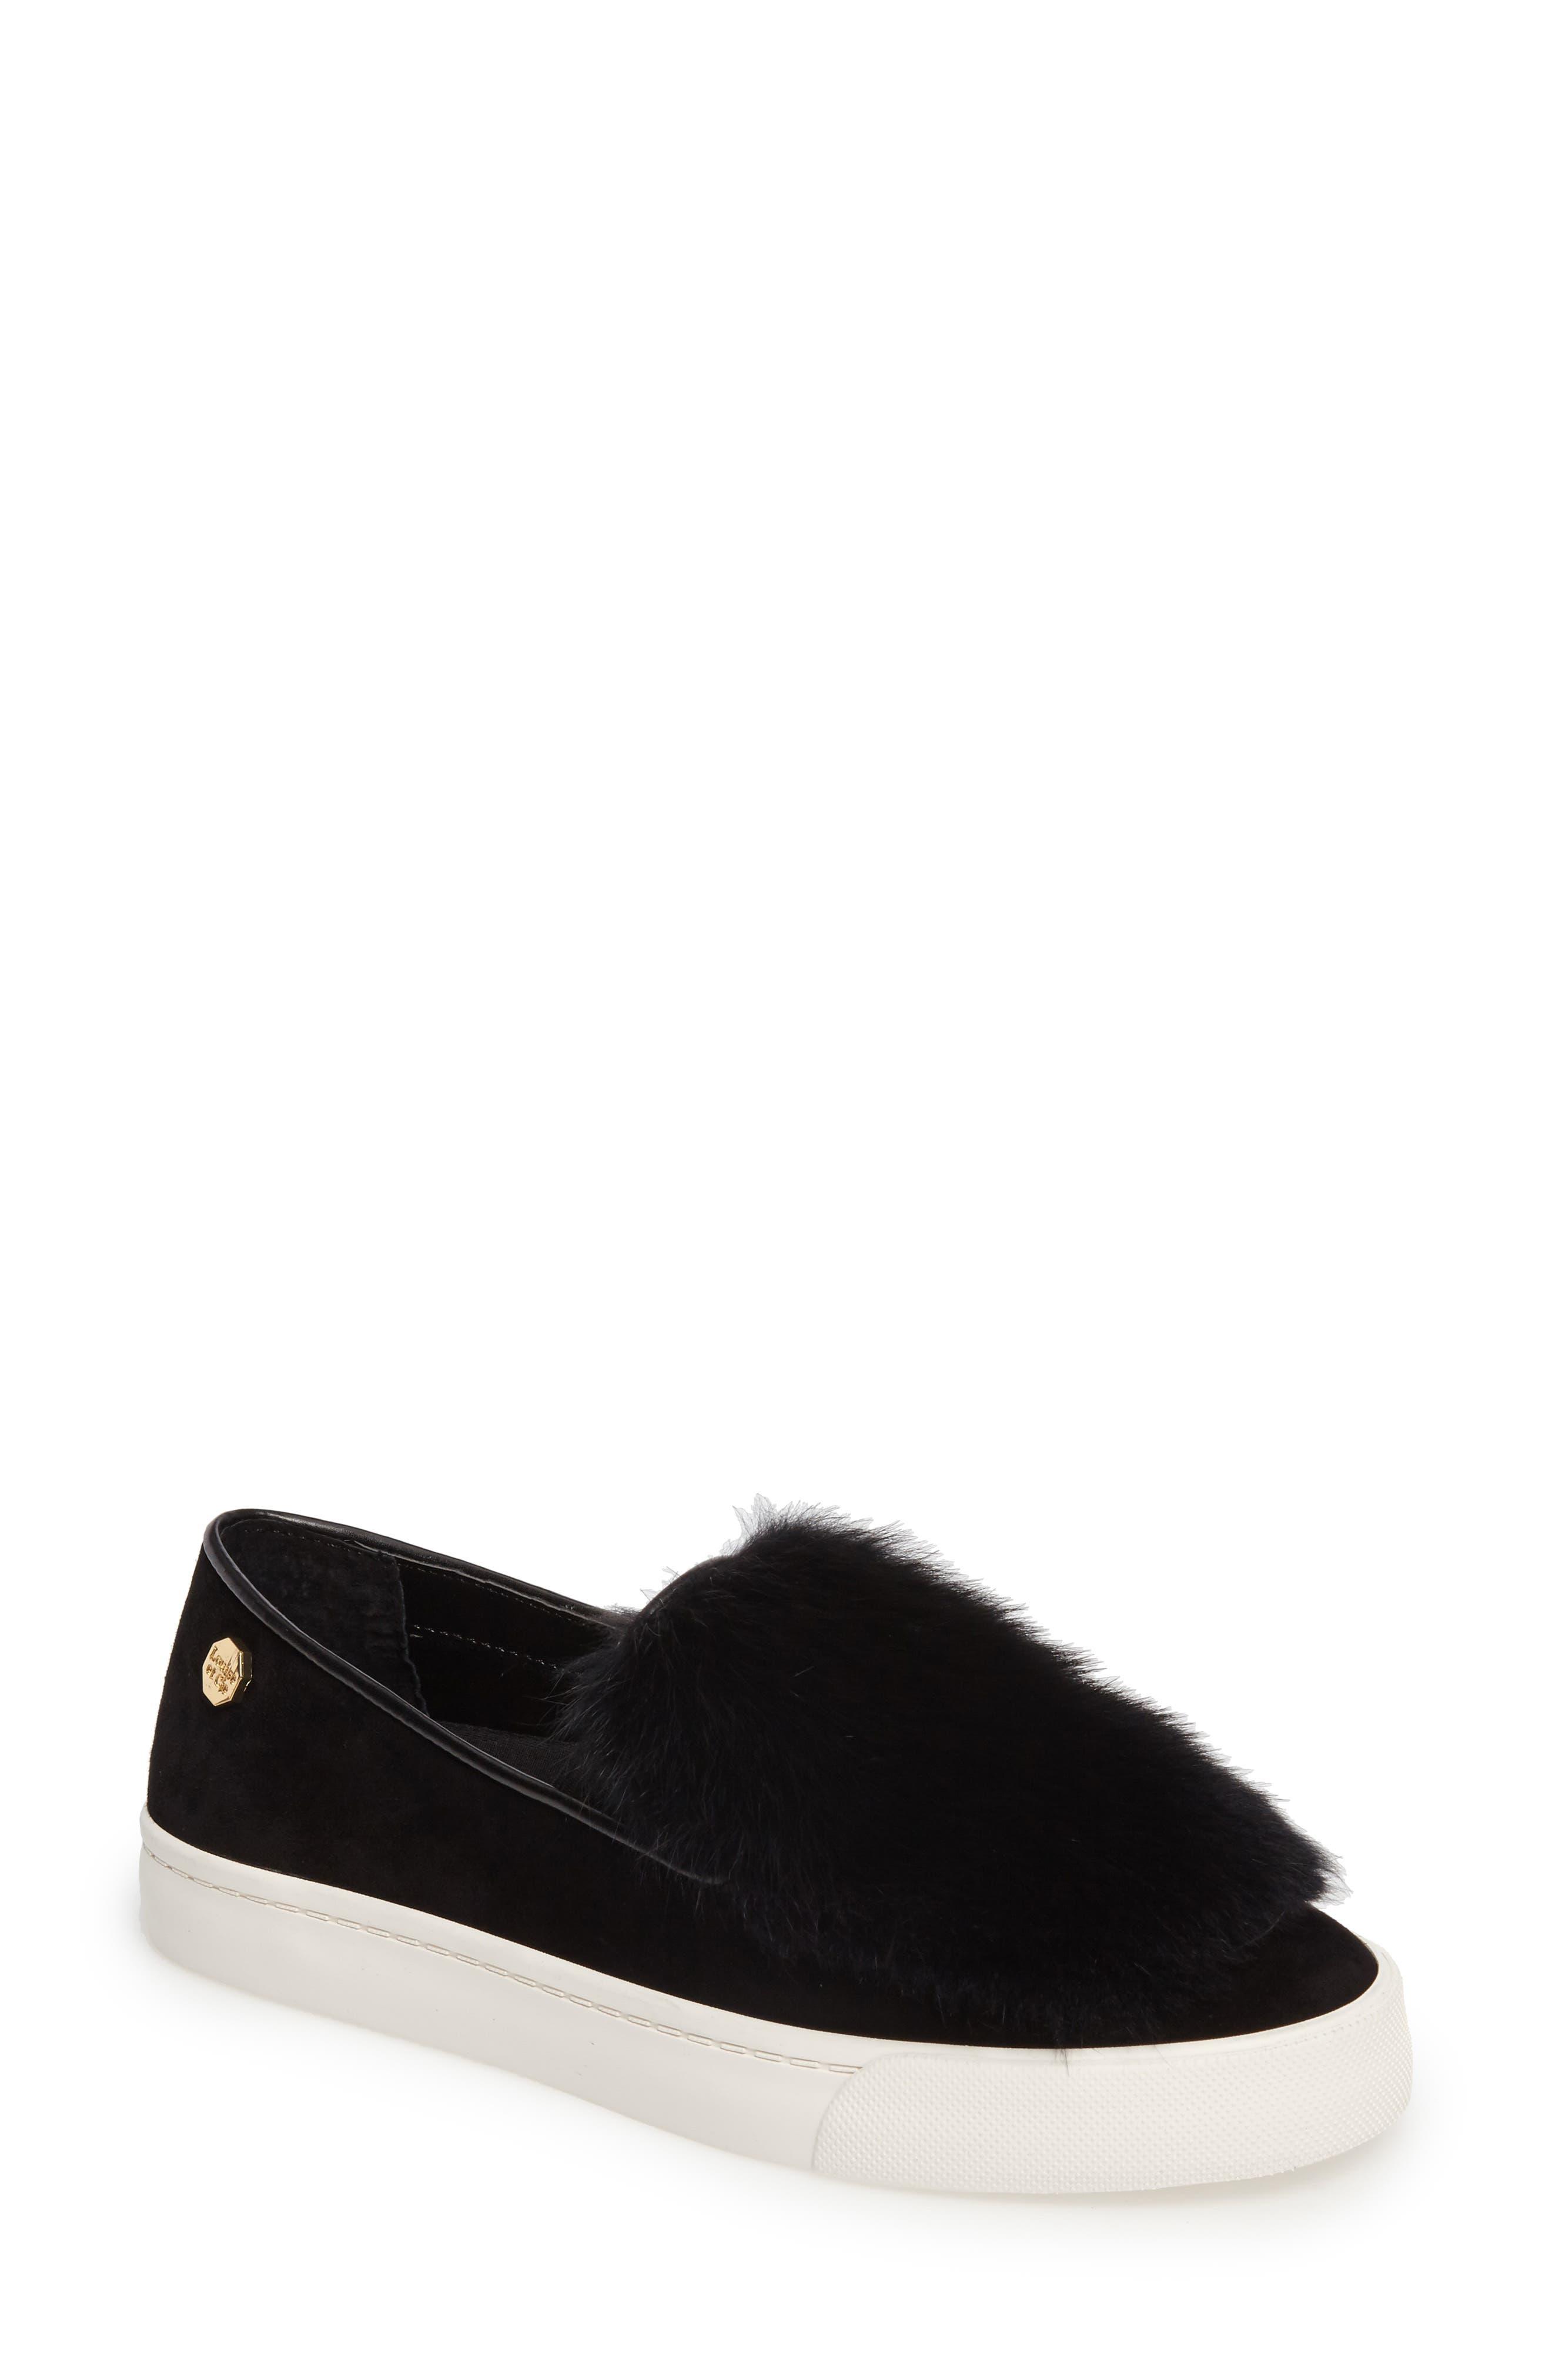 Bershner Genuine Rabbit Fur Slip-On Sneaker,                         Main,                         color, 001